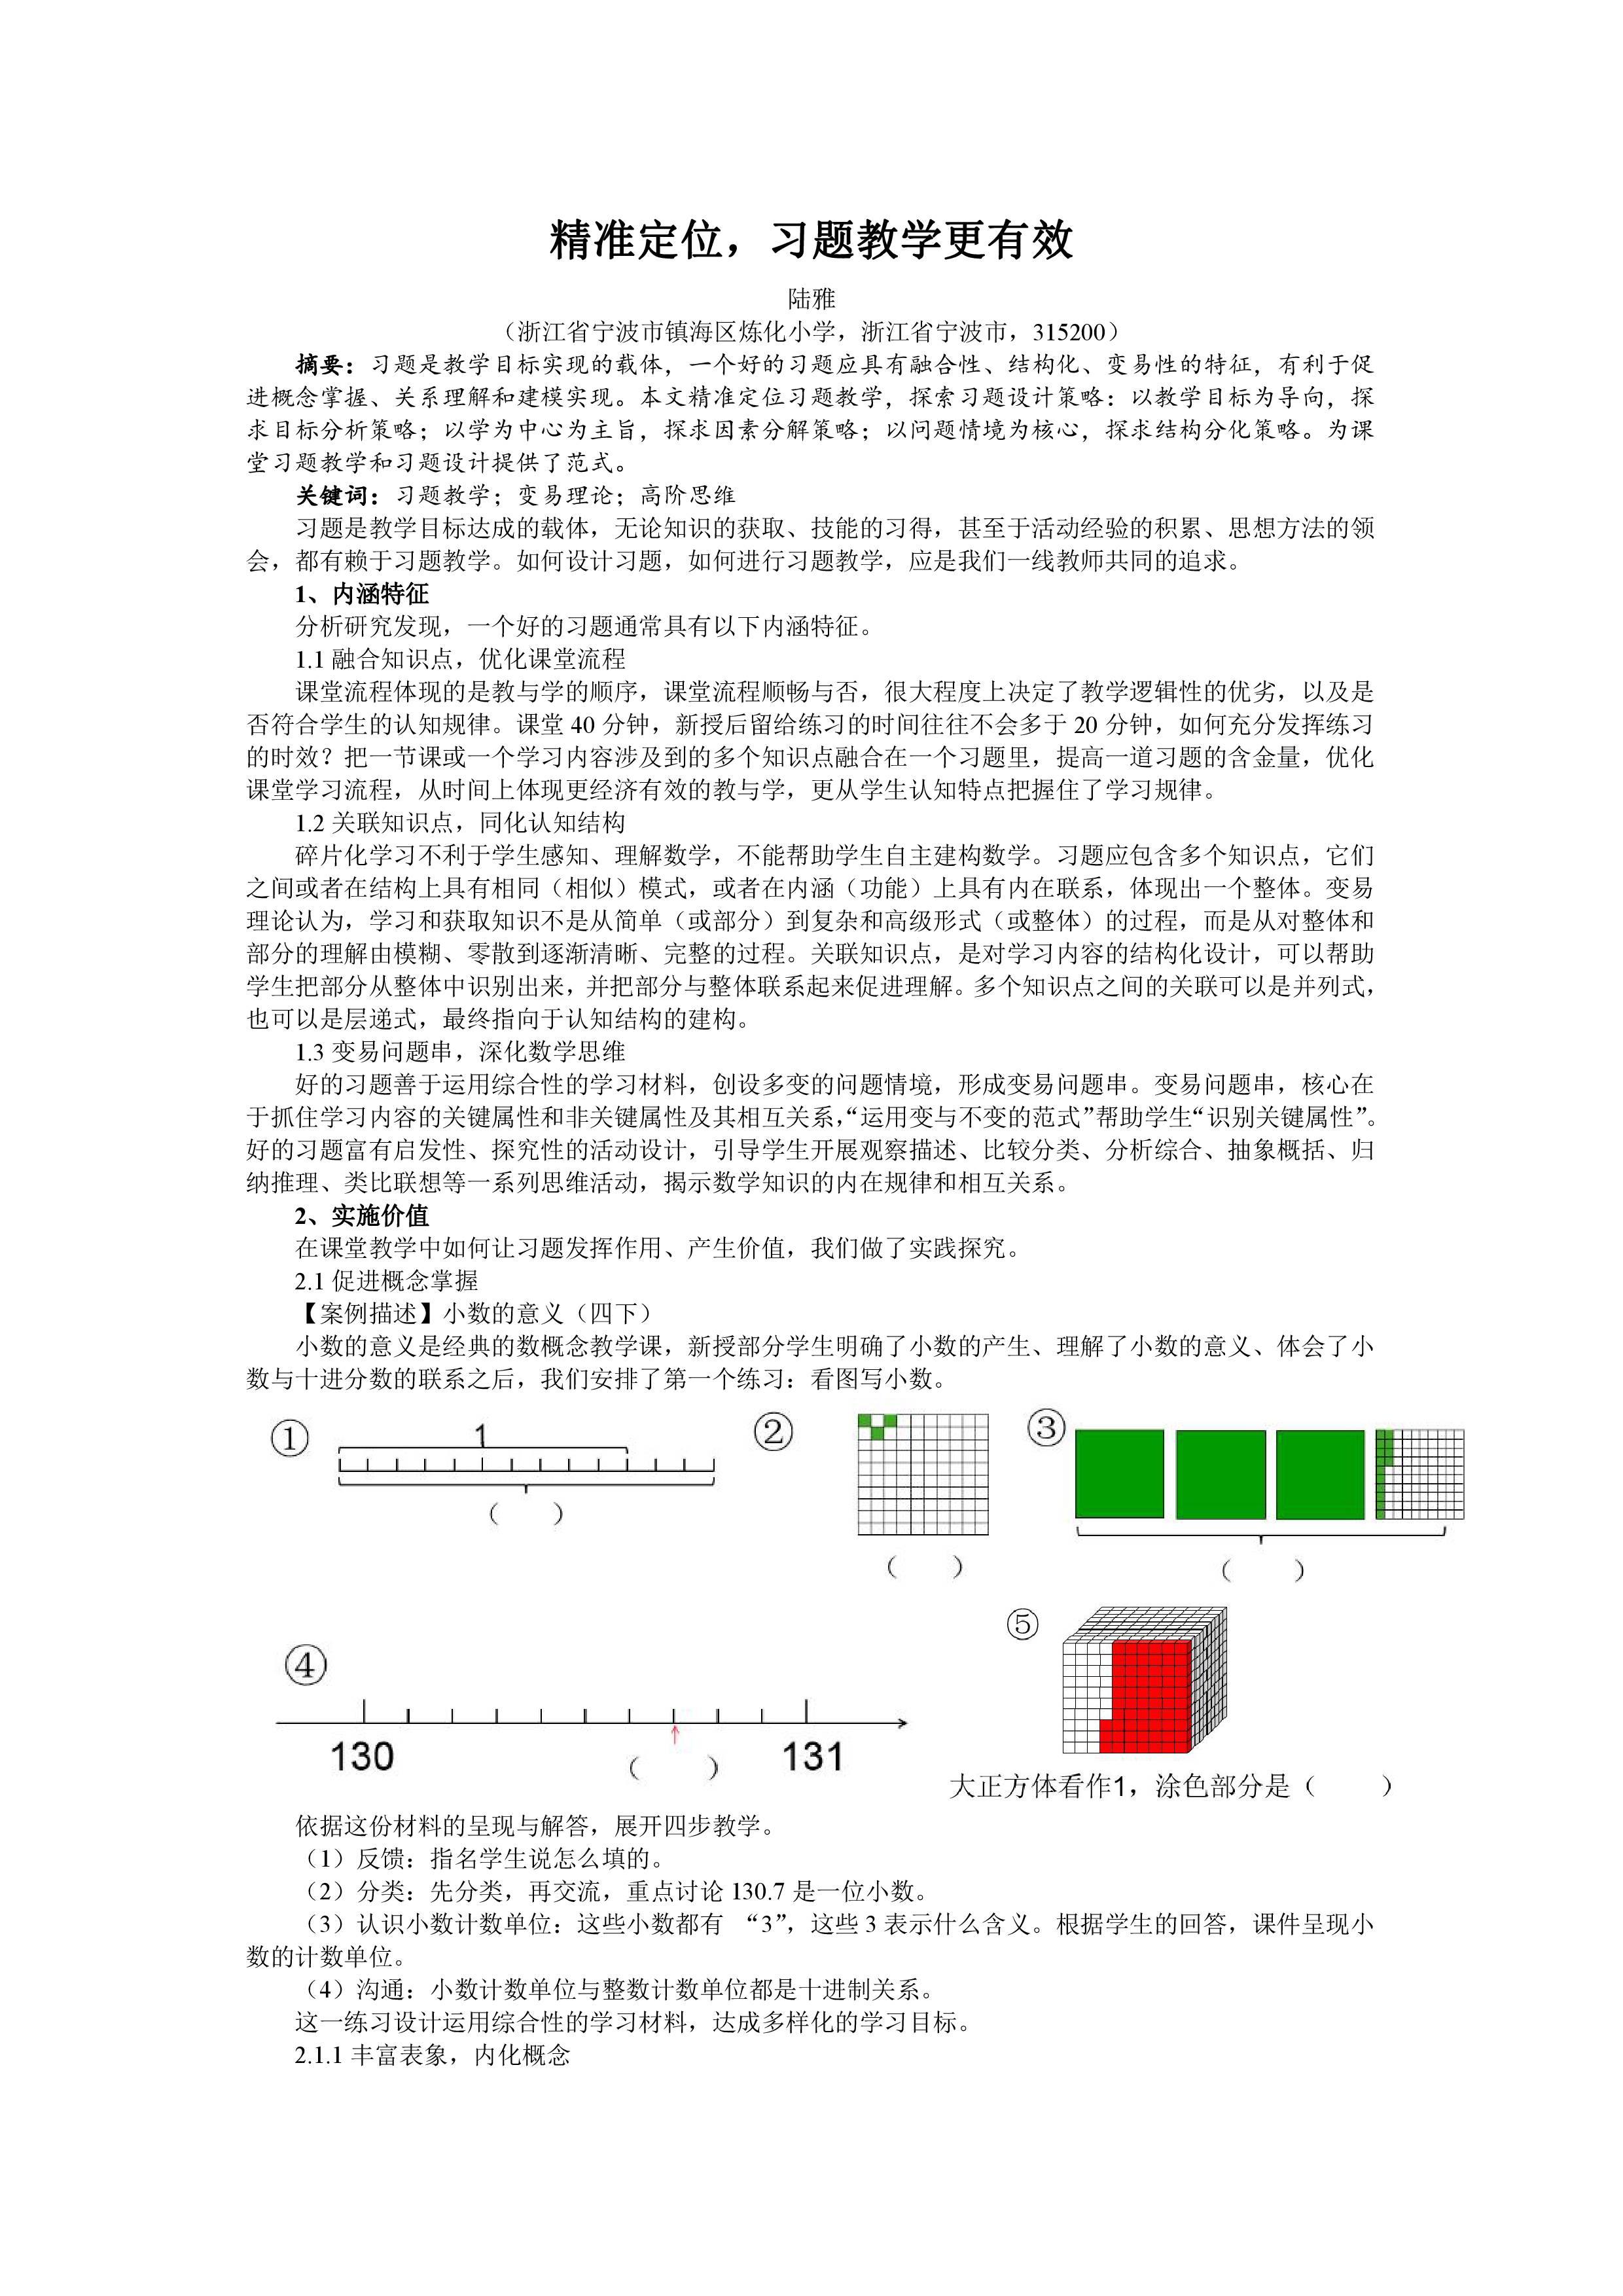 https://z3.ax1x.com/2021/07/26/WRTkz8.jpg